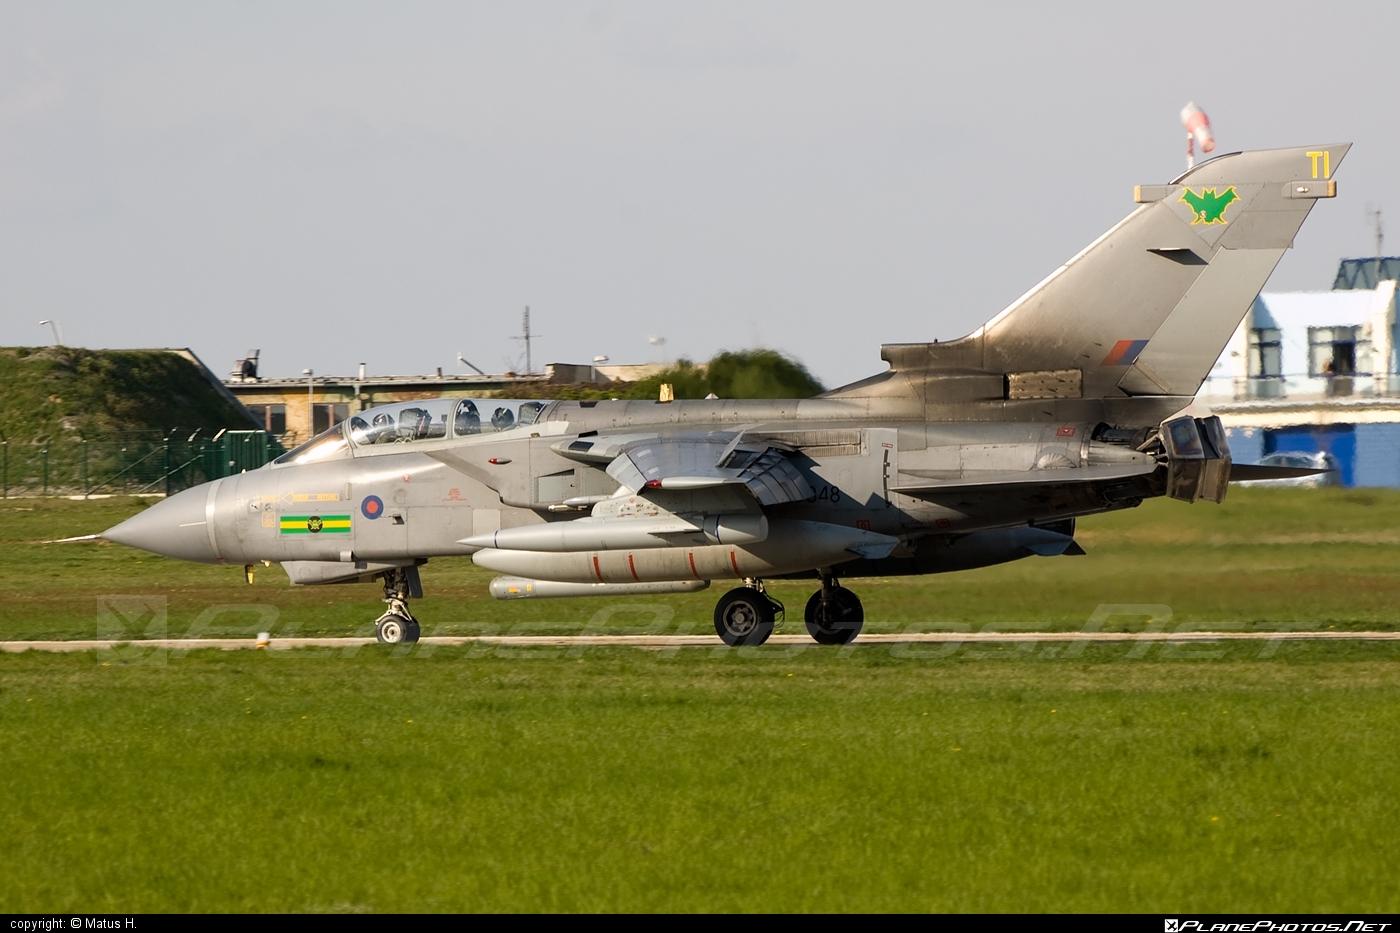 Panavia Tornado GR.4 - ZD848 operated by Royal Air Force (RAF) #panavia #panaviatornado #raf #royalairforce #tornadogr4